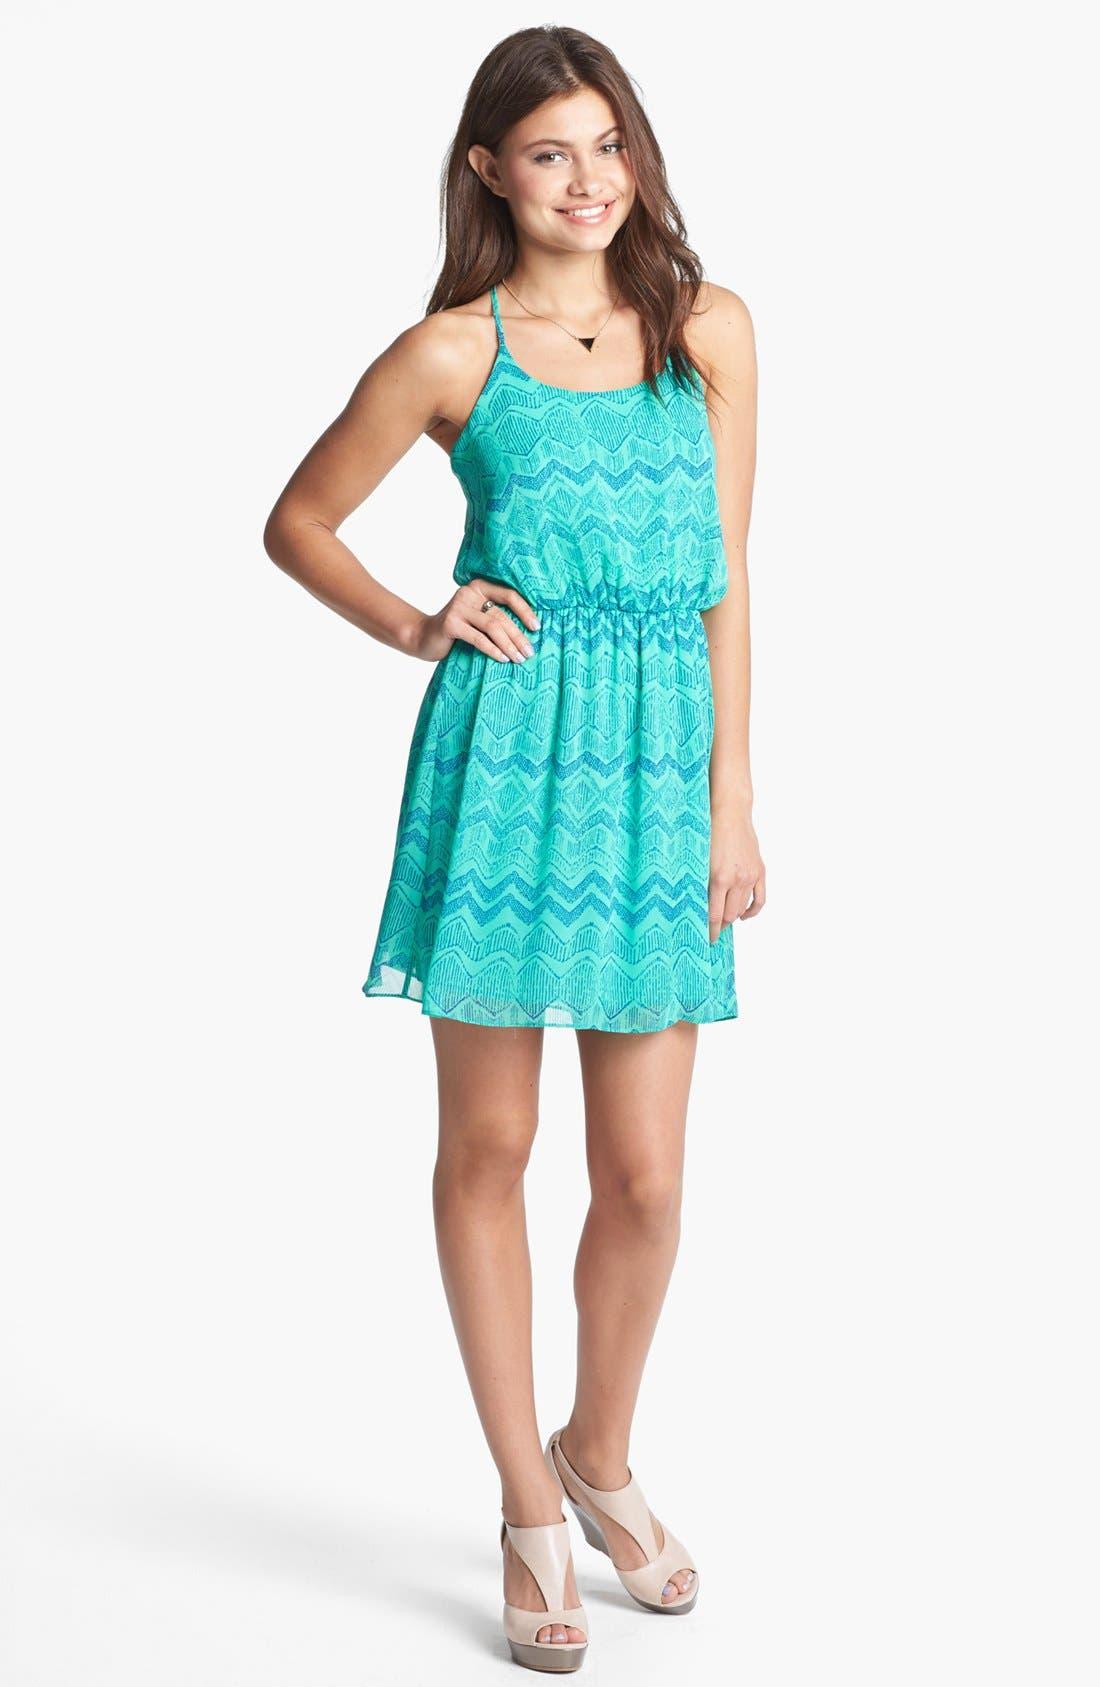 Alternate Image 1 Selected - Soprano Strappy Print Racerback Dress (Juniors)